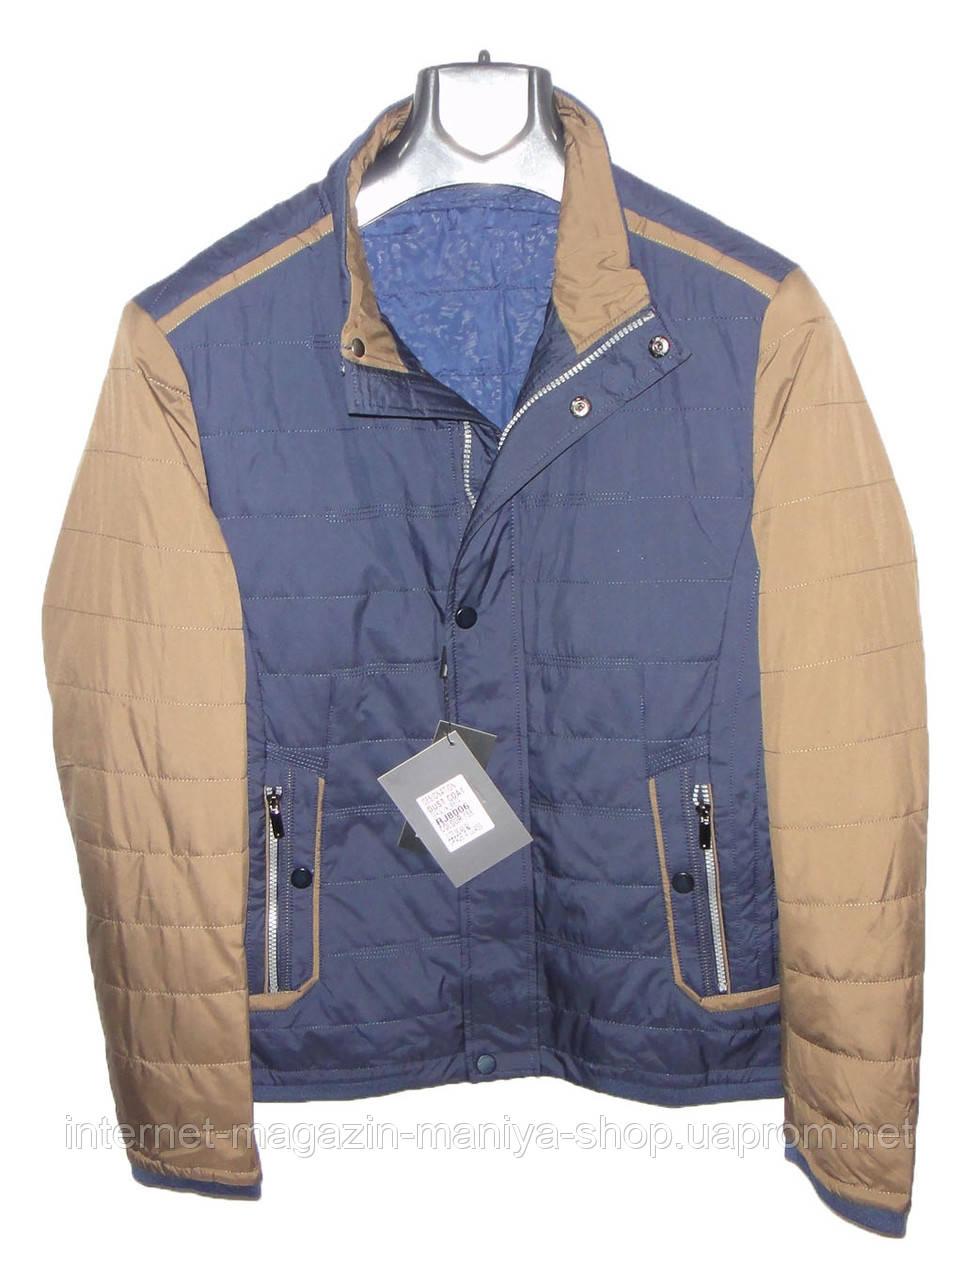 Куртка мужская RJ8006 (деми)